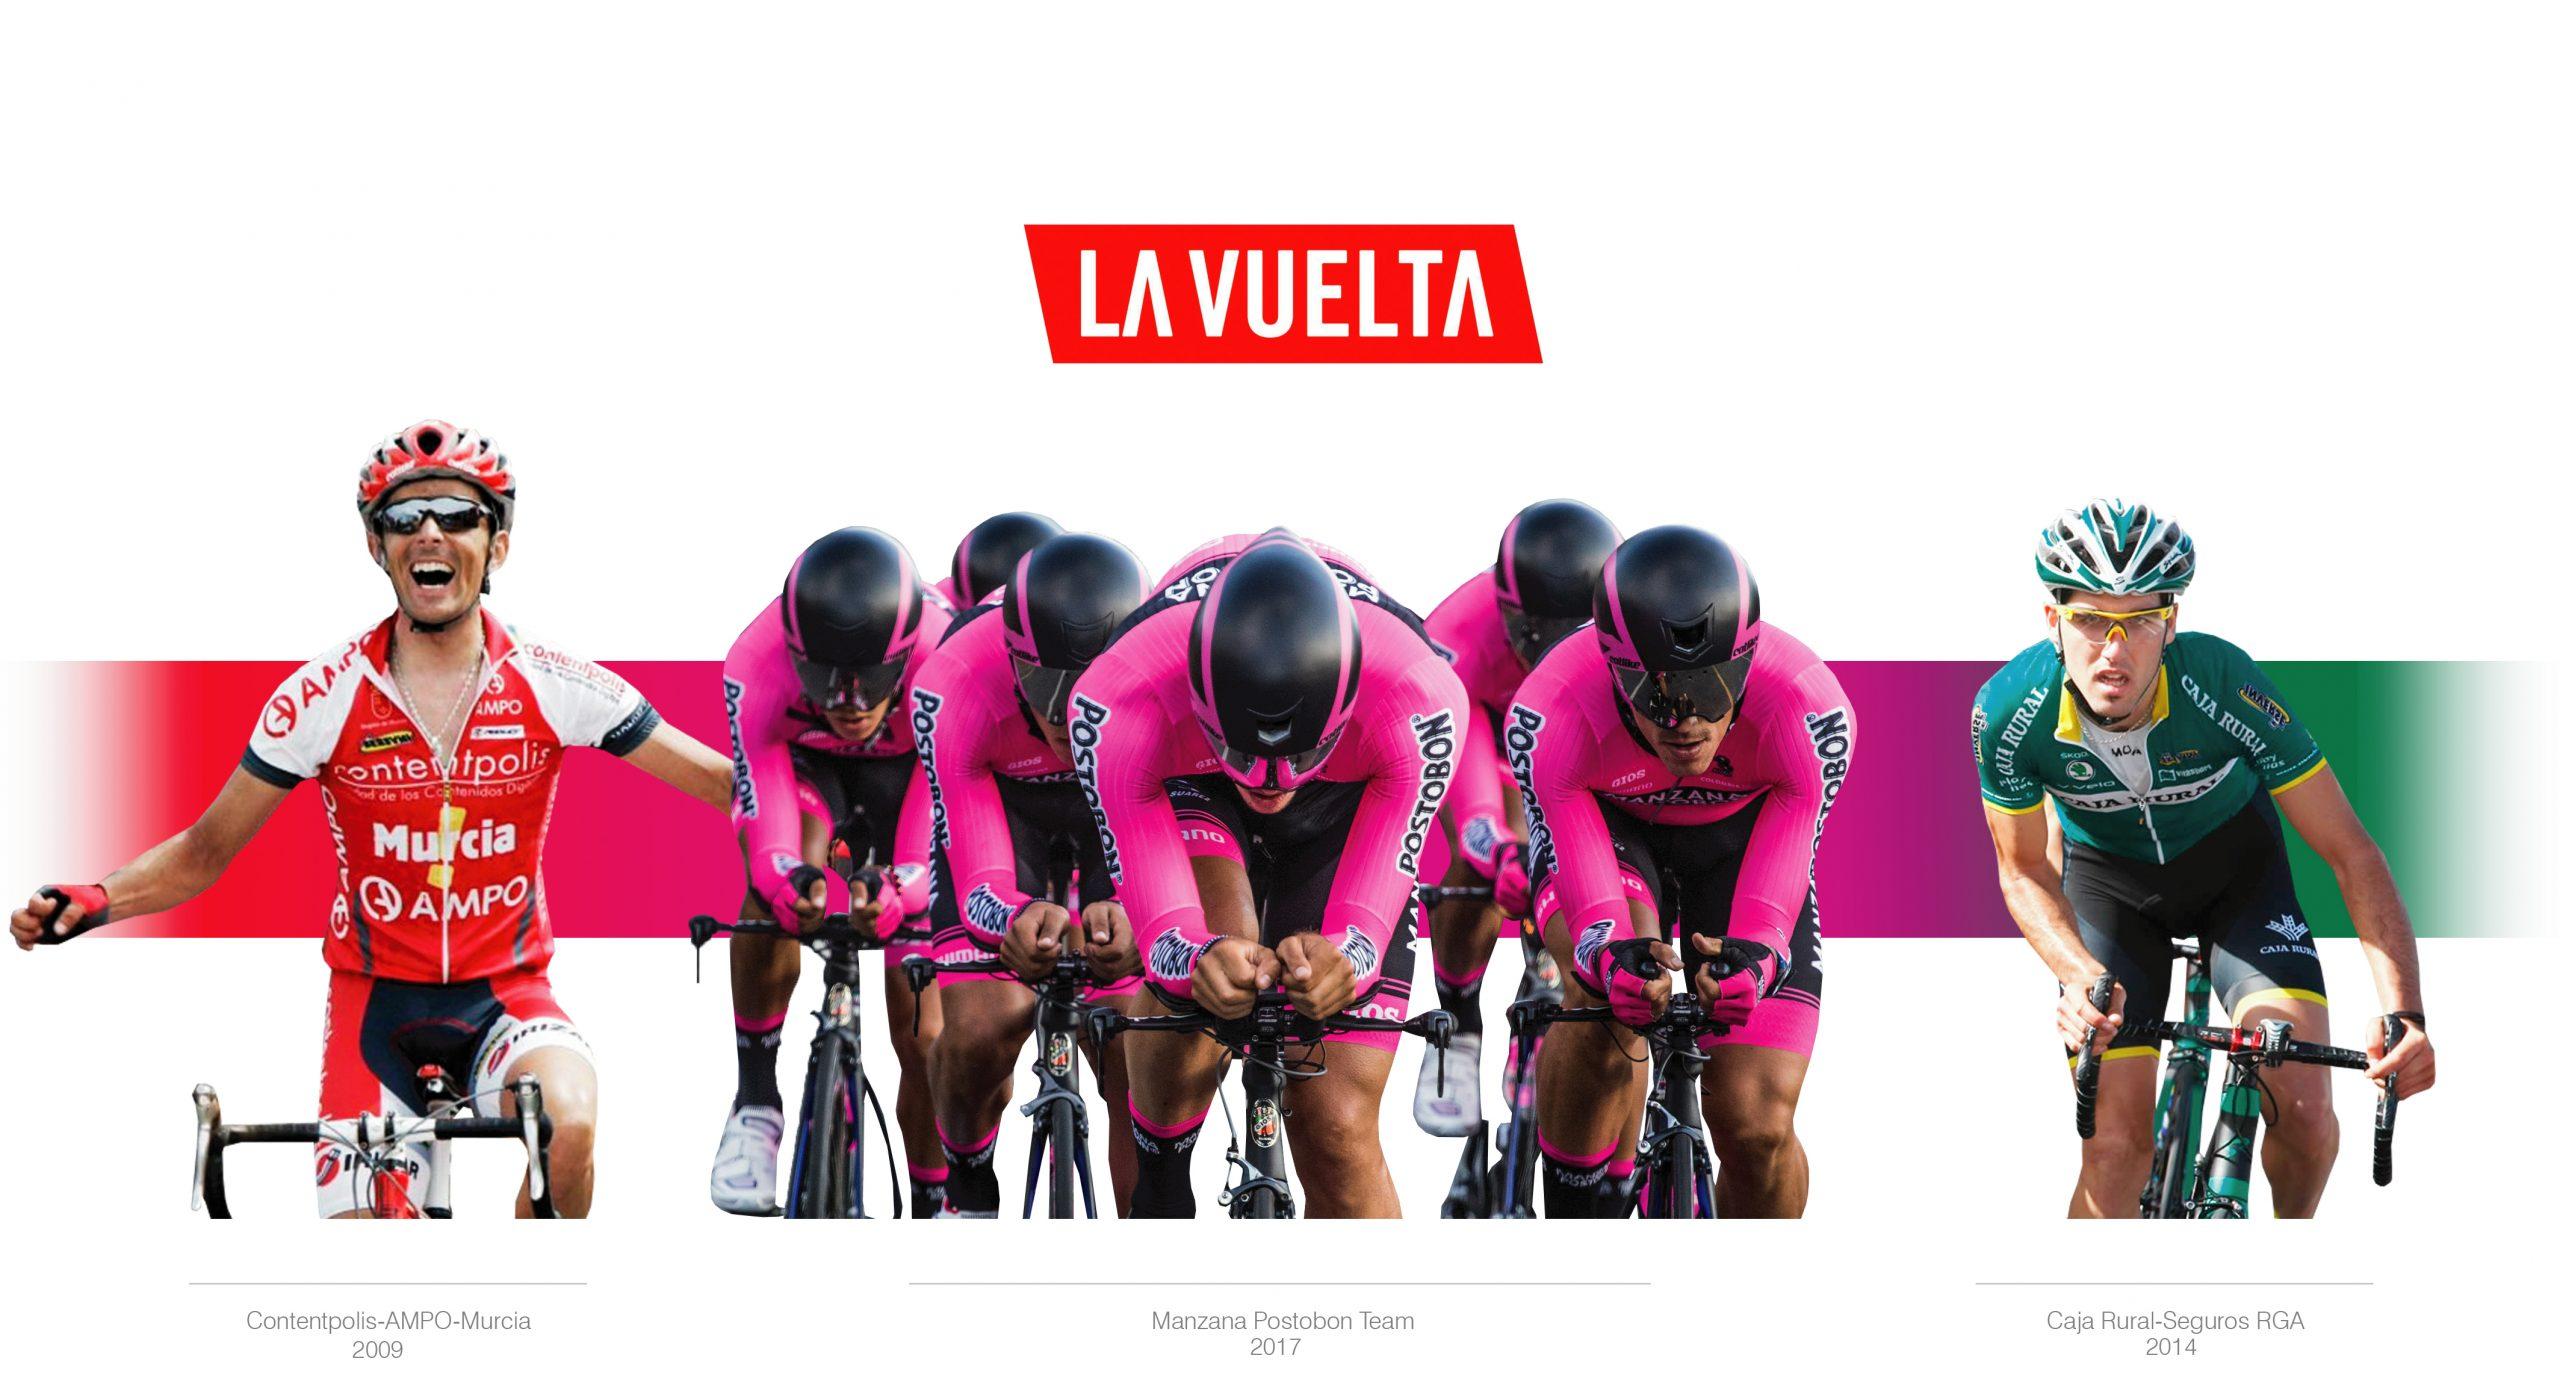 essax-singel-sillin-bike-saddle-ciclismo-cycling-vuelta-españa